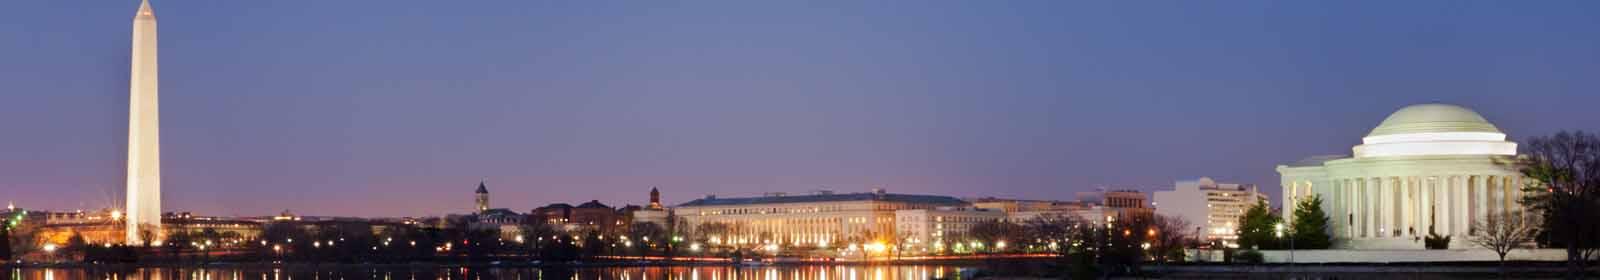 National Mall skyline in Washington, D.C.